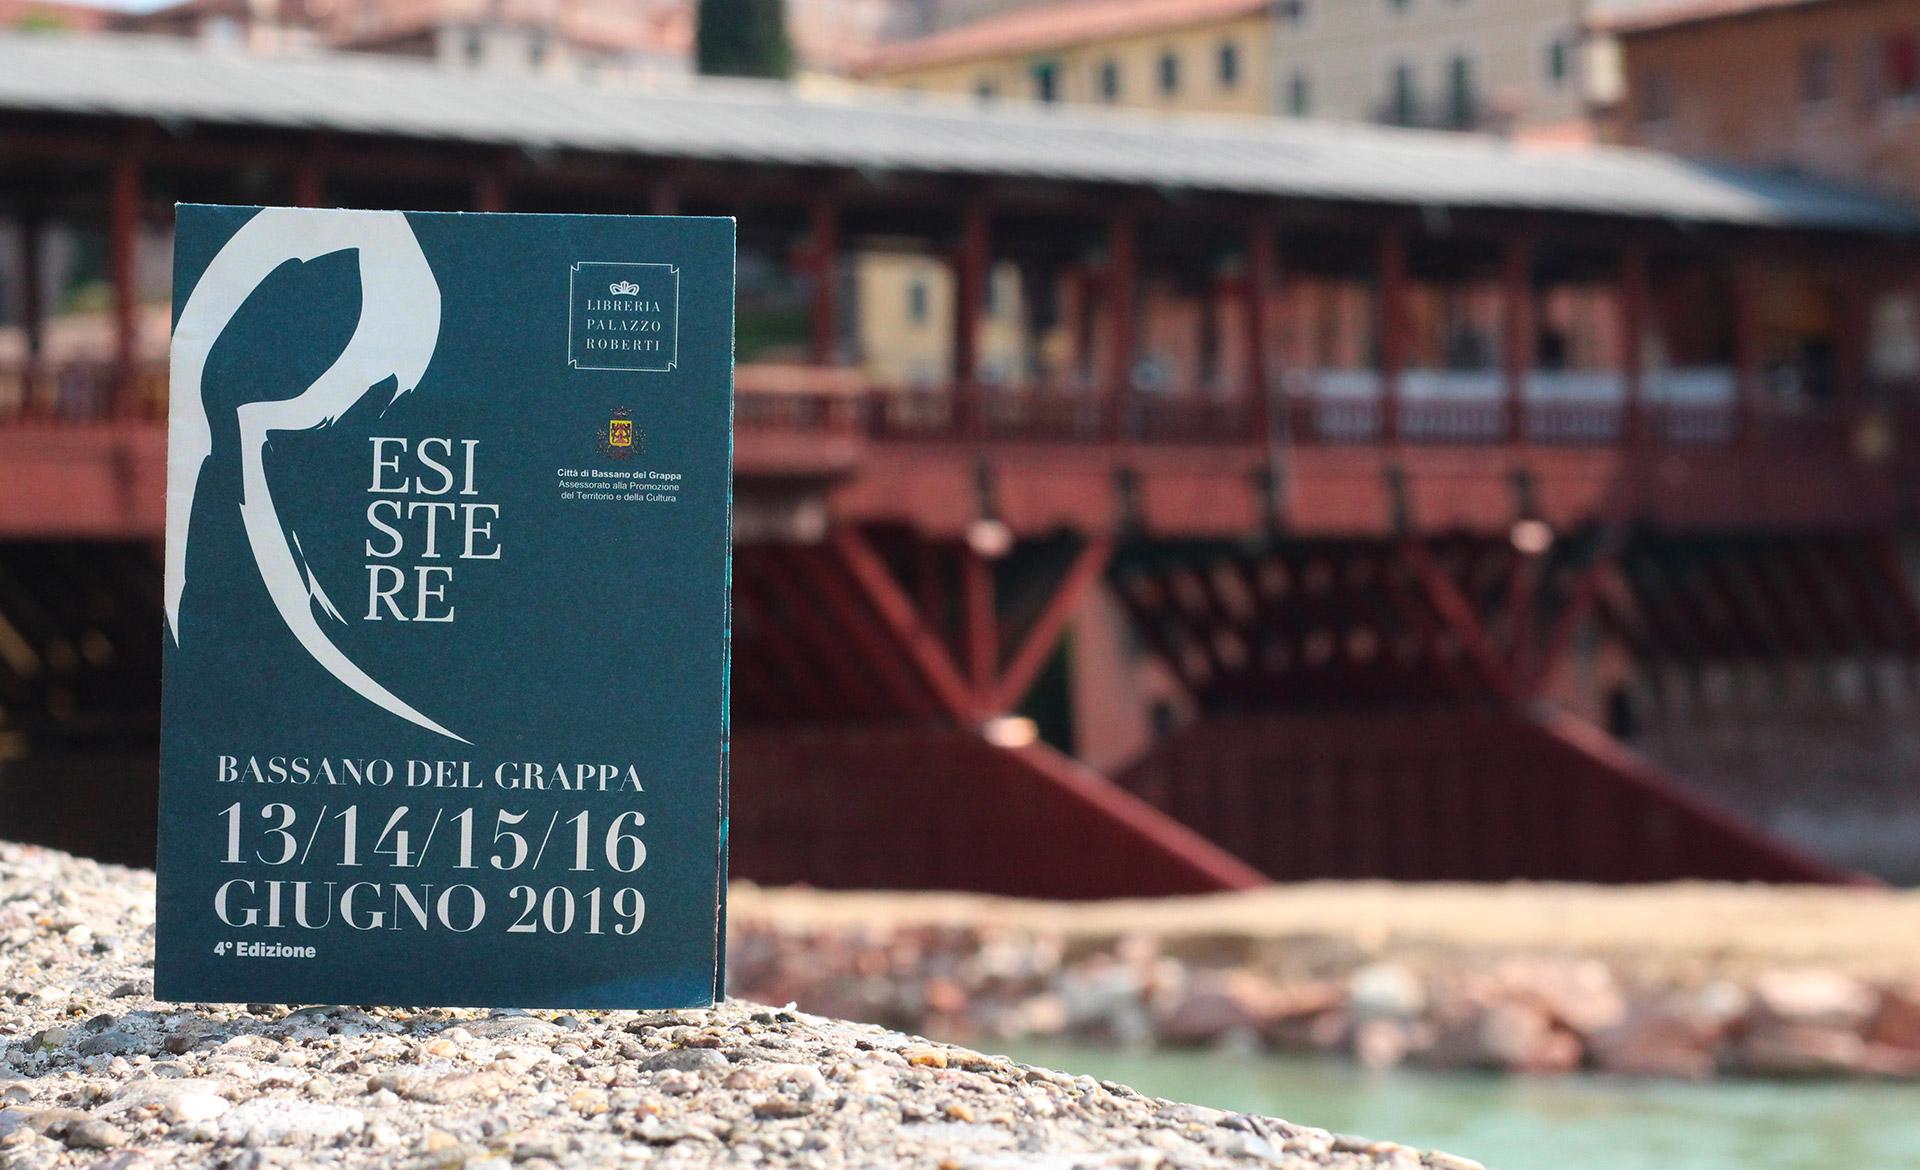 Resistere-Palazzo-Roberti-Blank-2019-2